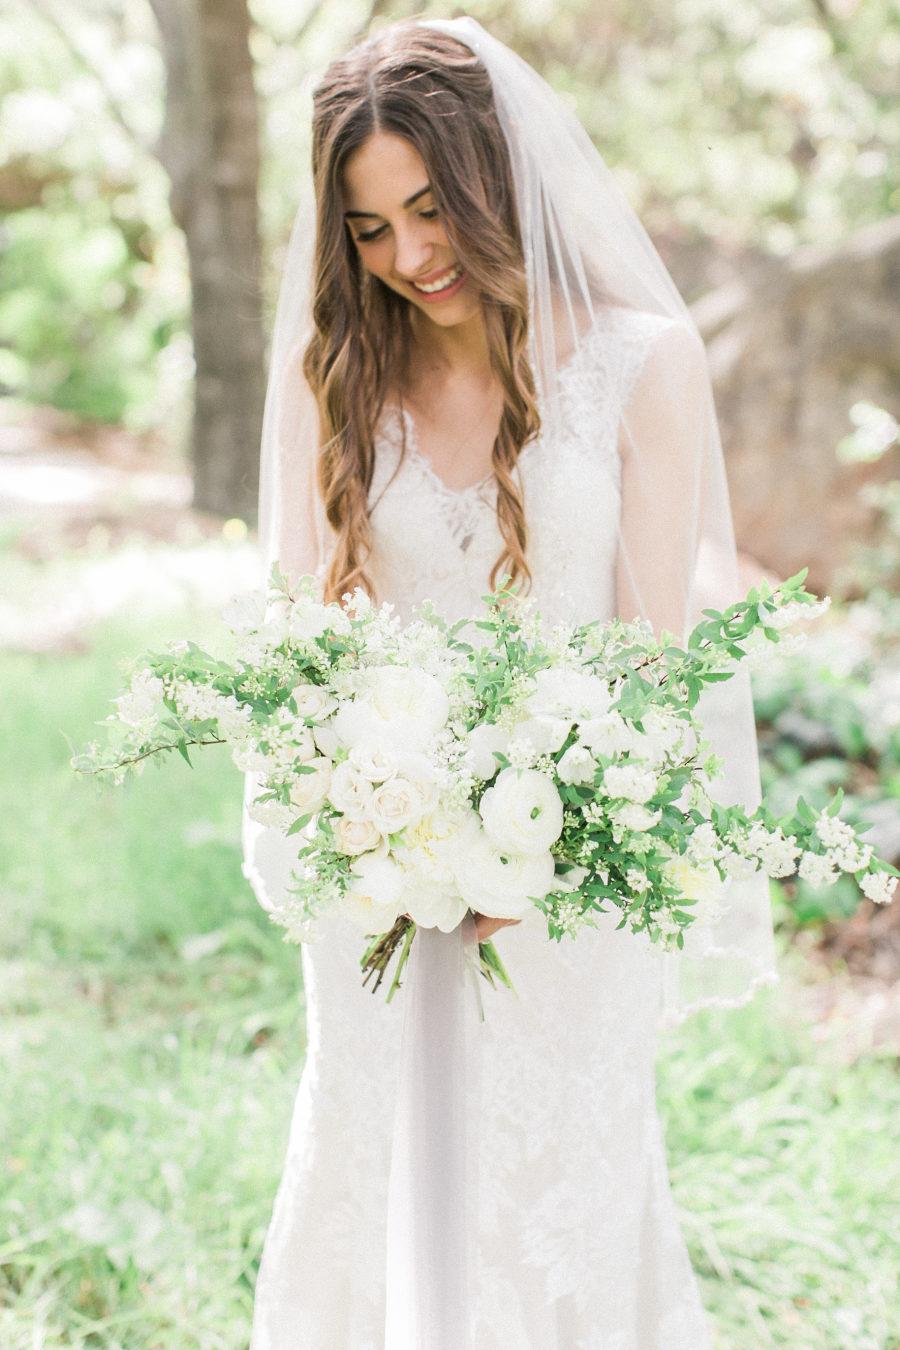 Thrift Store Wedding Dresses 62 Epic